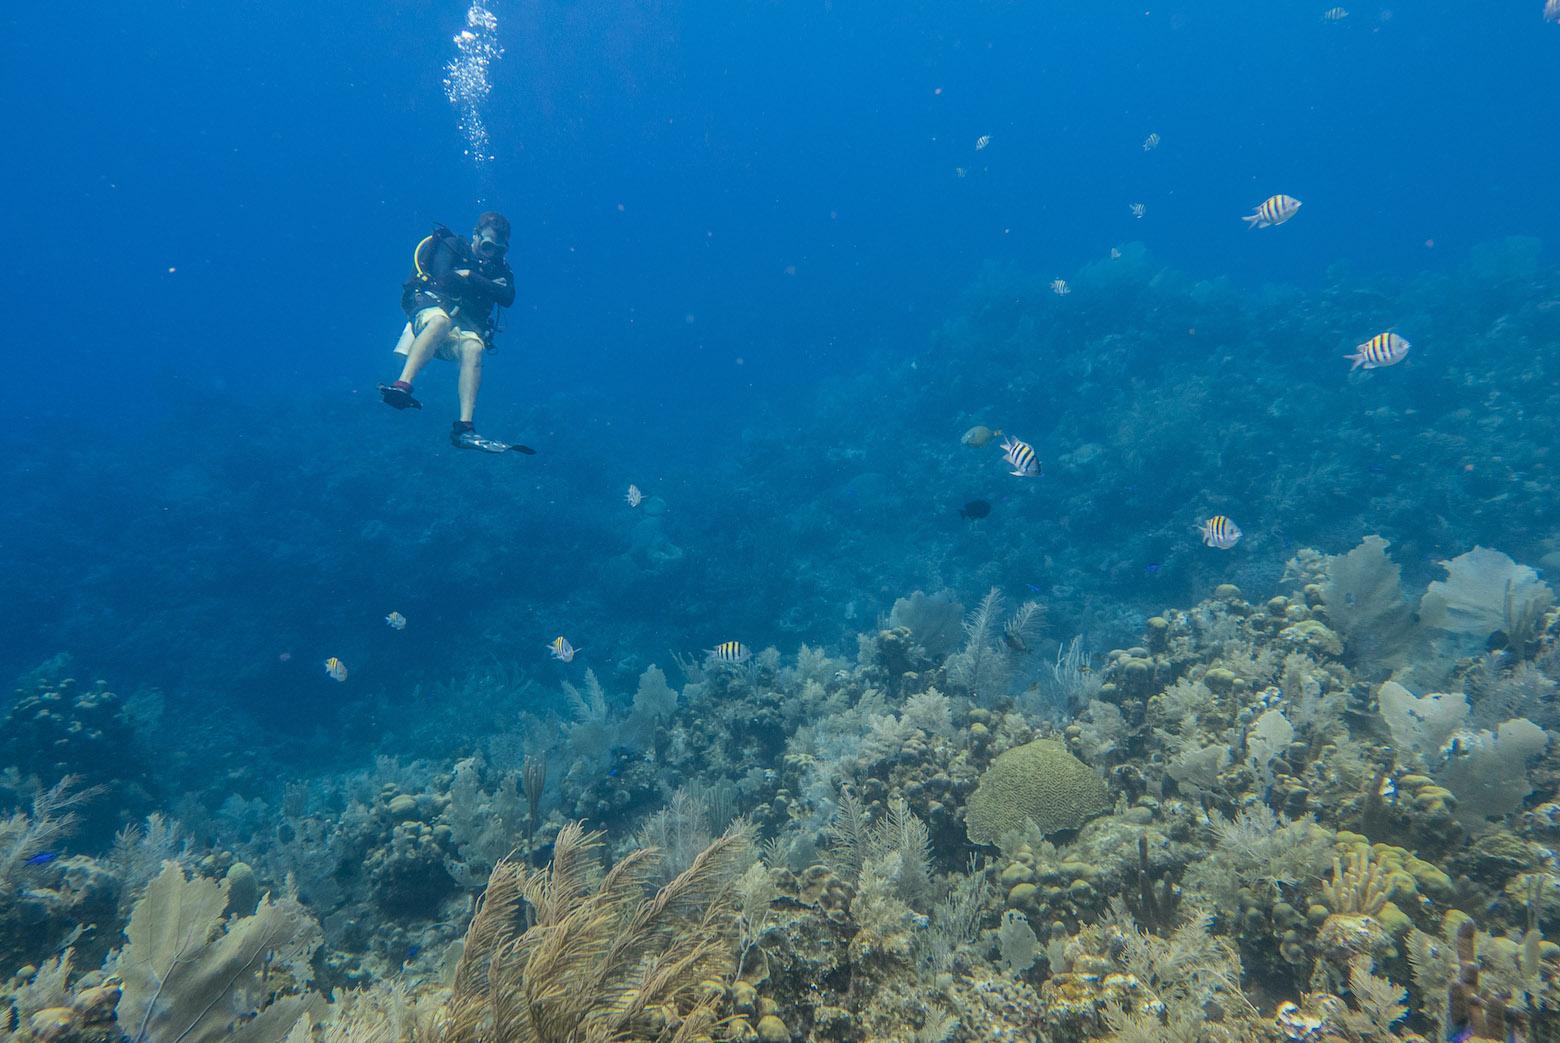 Scuba Diving in Reef off Roatan